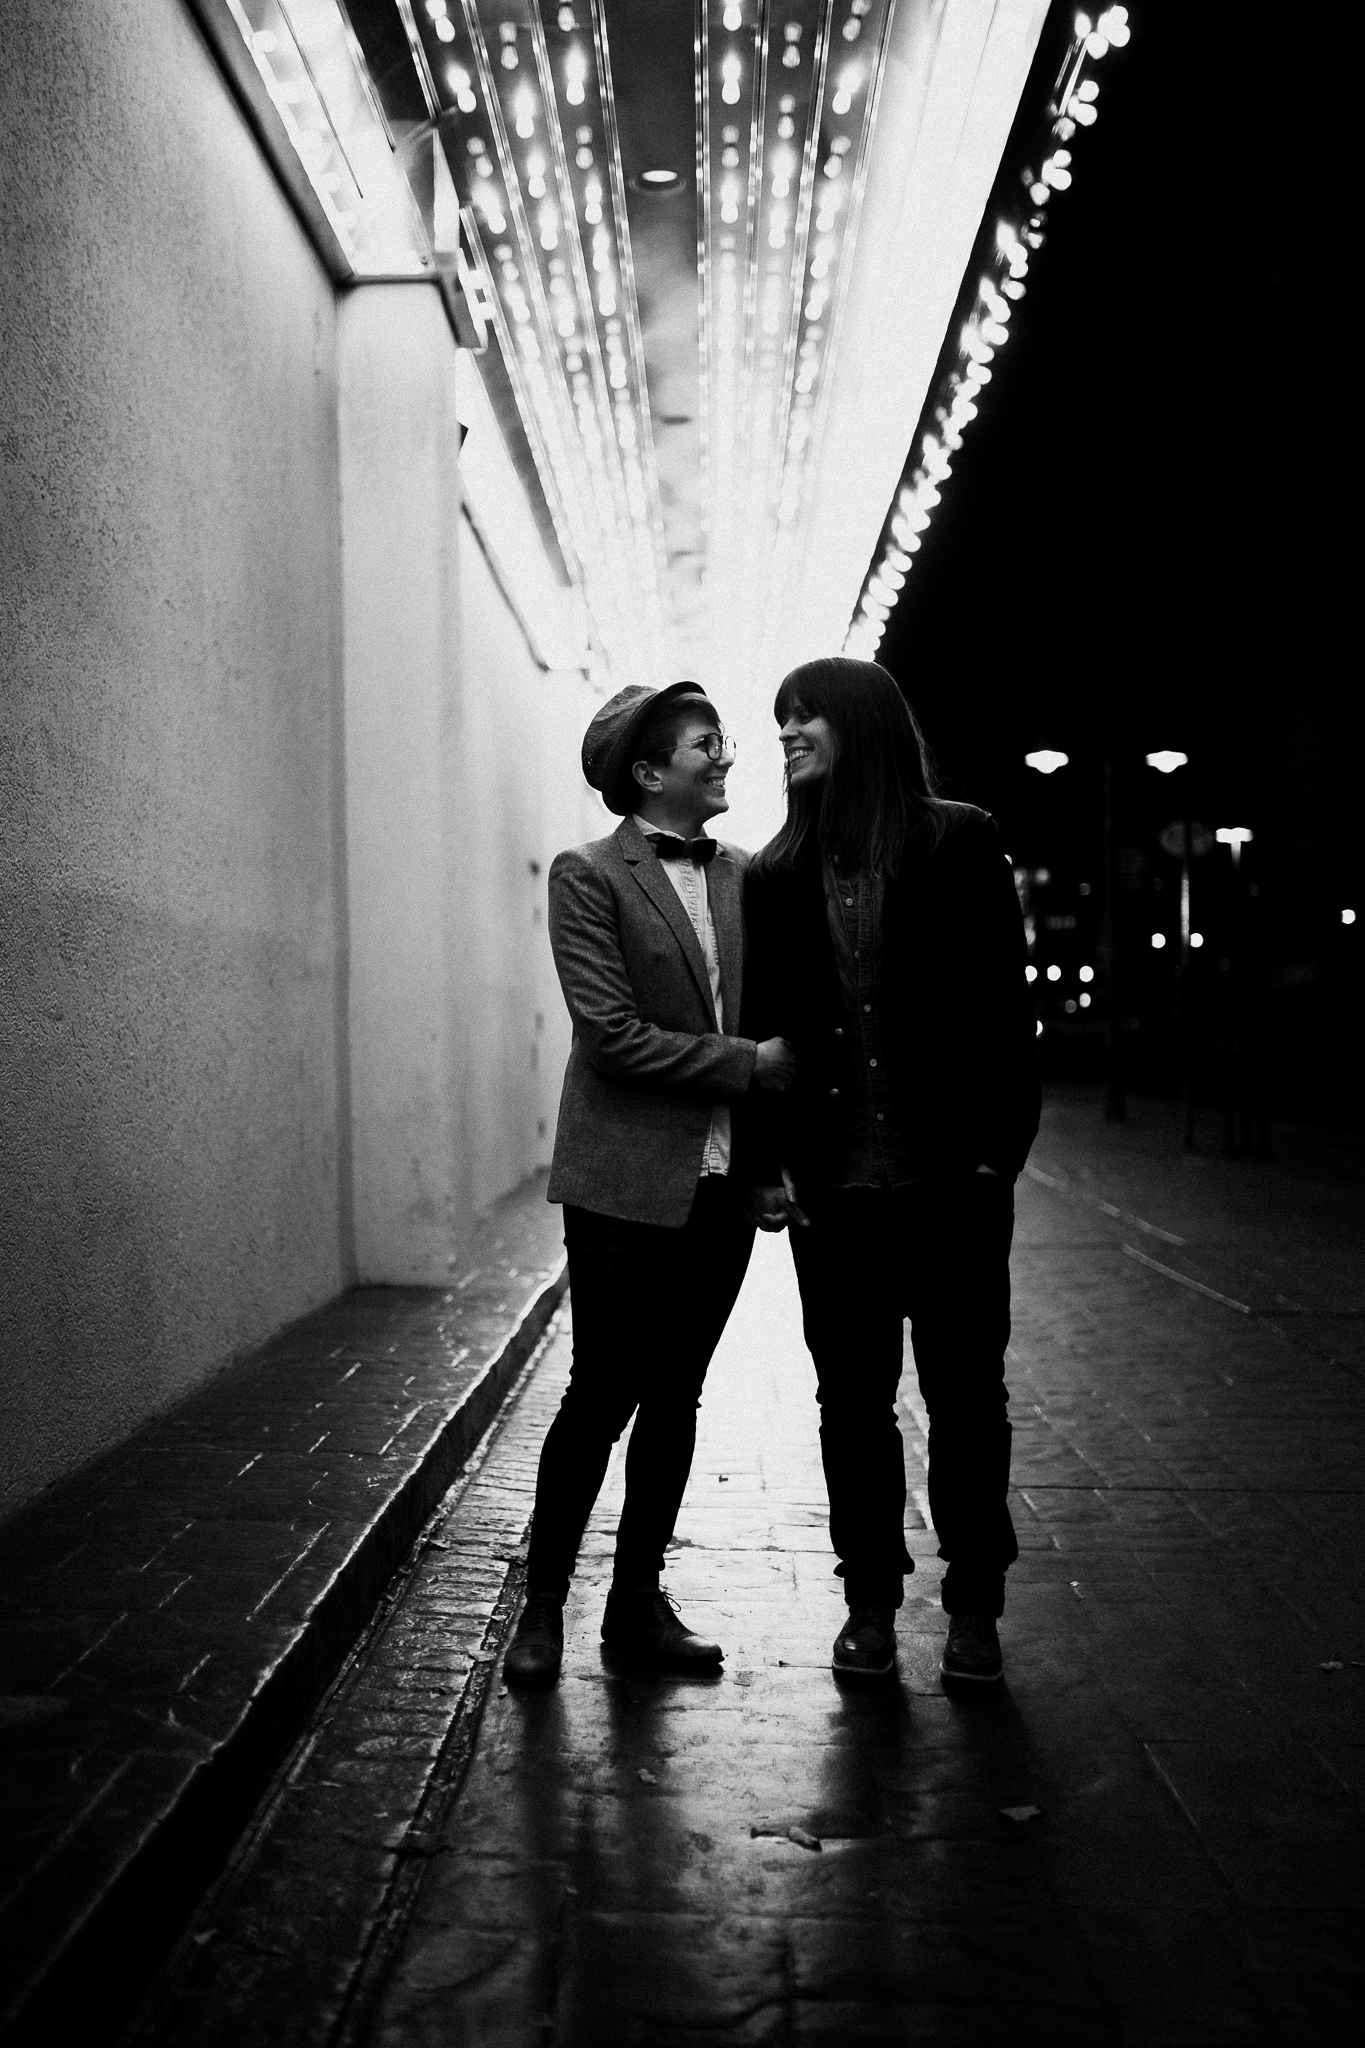 Archer Inspired Photography Hilary and Gia LGTBQ Reno Nevada Couple Wedding Engagement Photographer-13.jpg